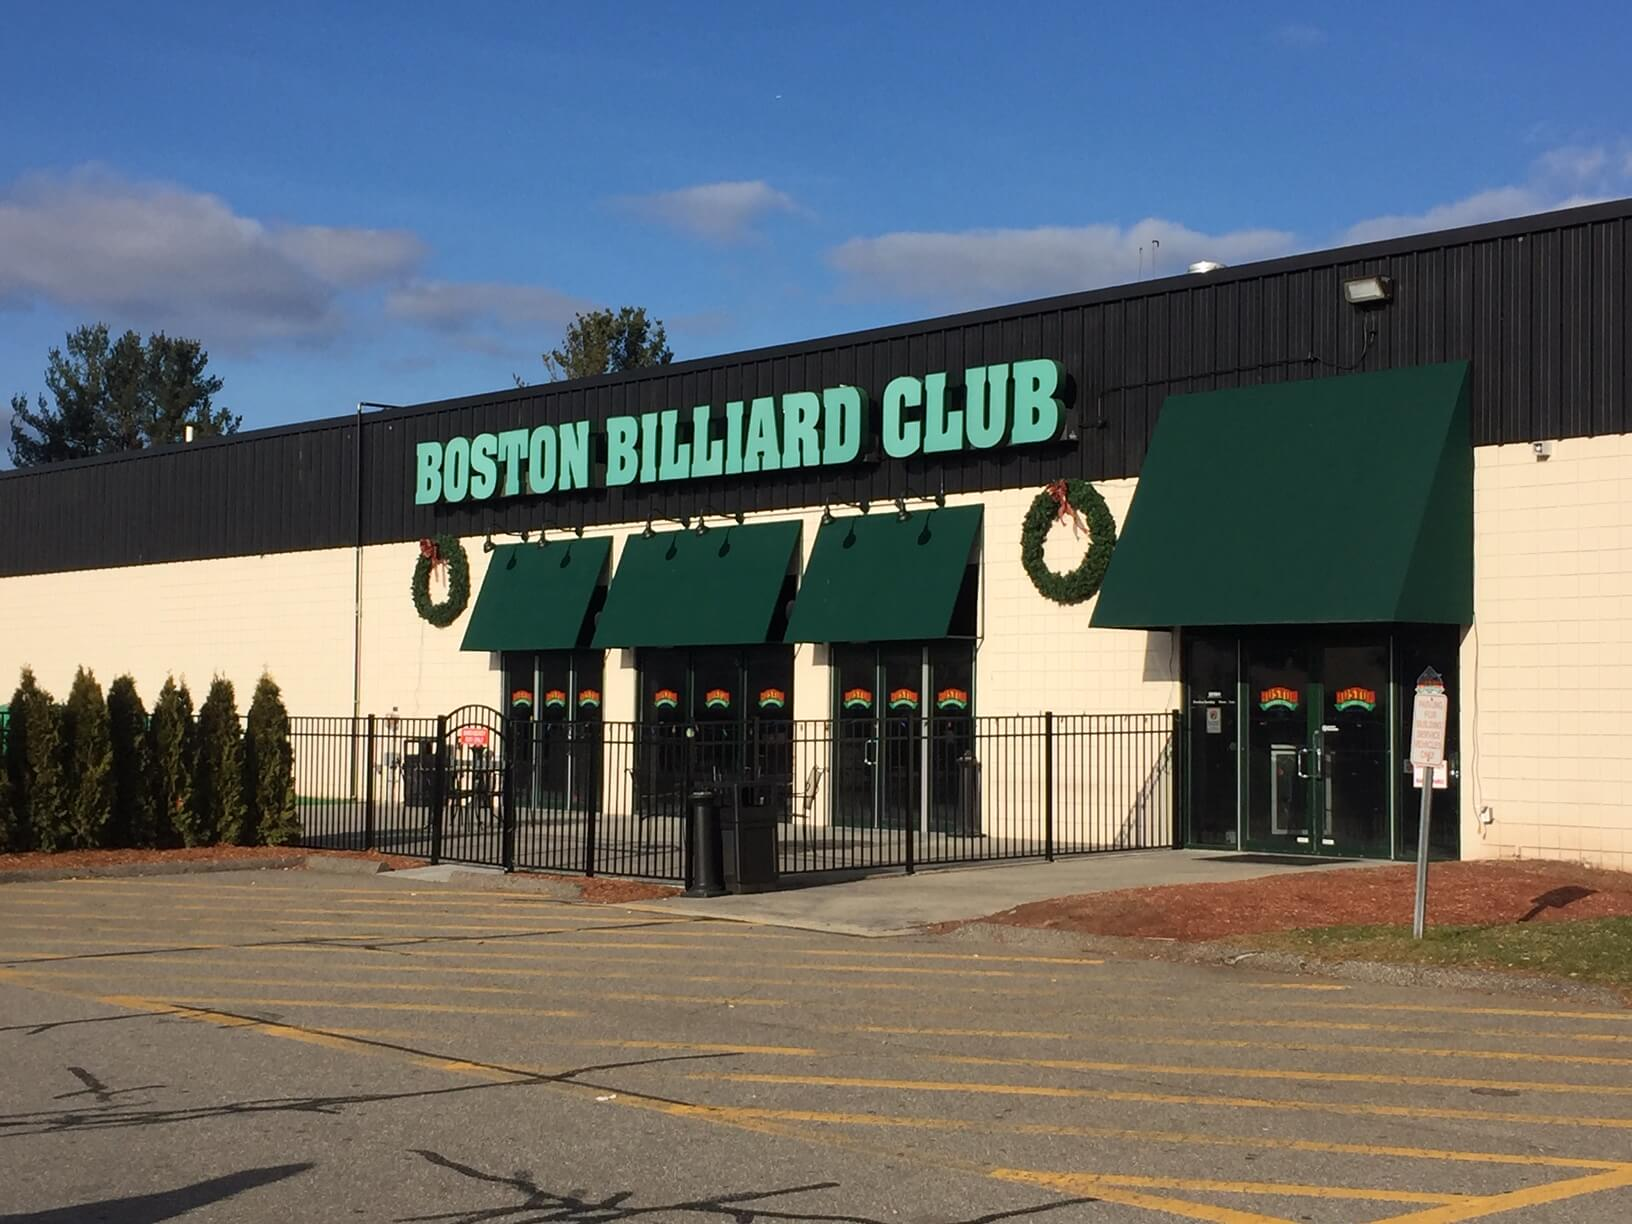 Boston Billiard Poker Room Entrance